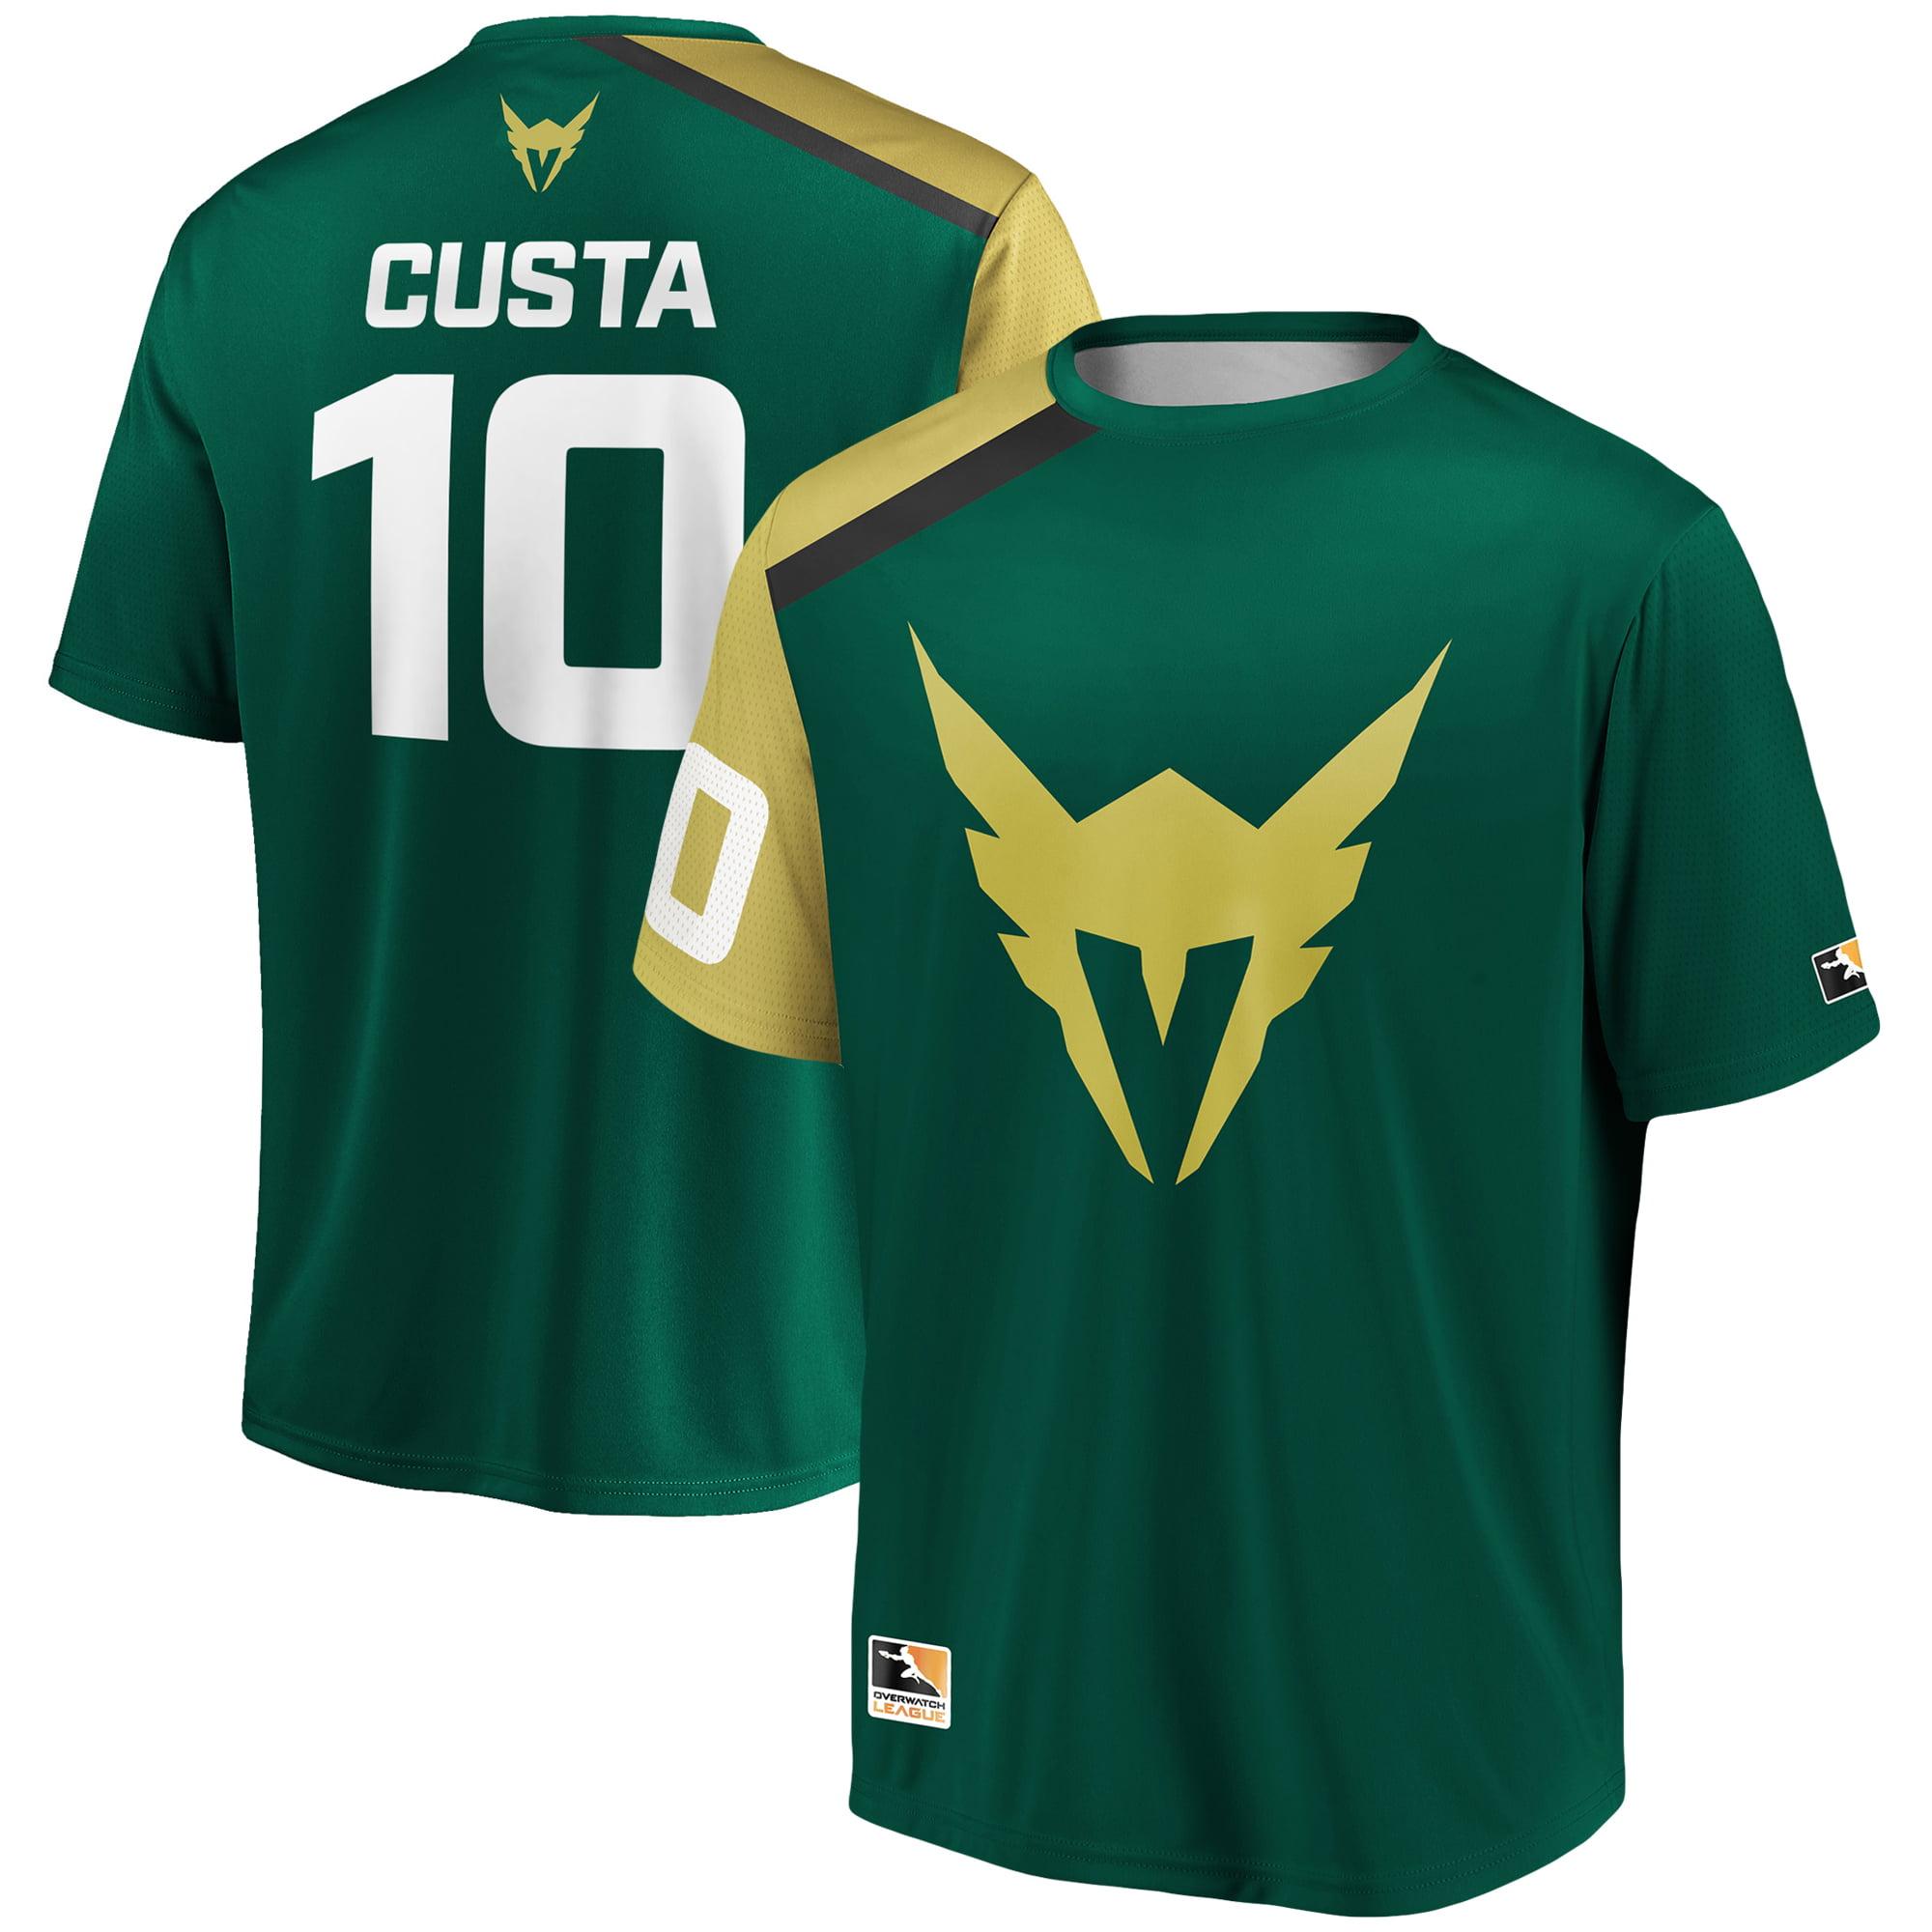 Custa Los Angeles Valiant Overwatch League Replica Home Jersey - Green